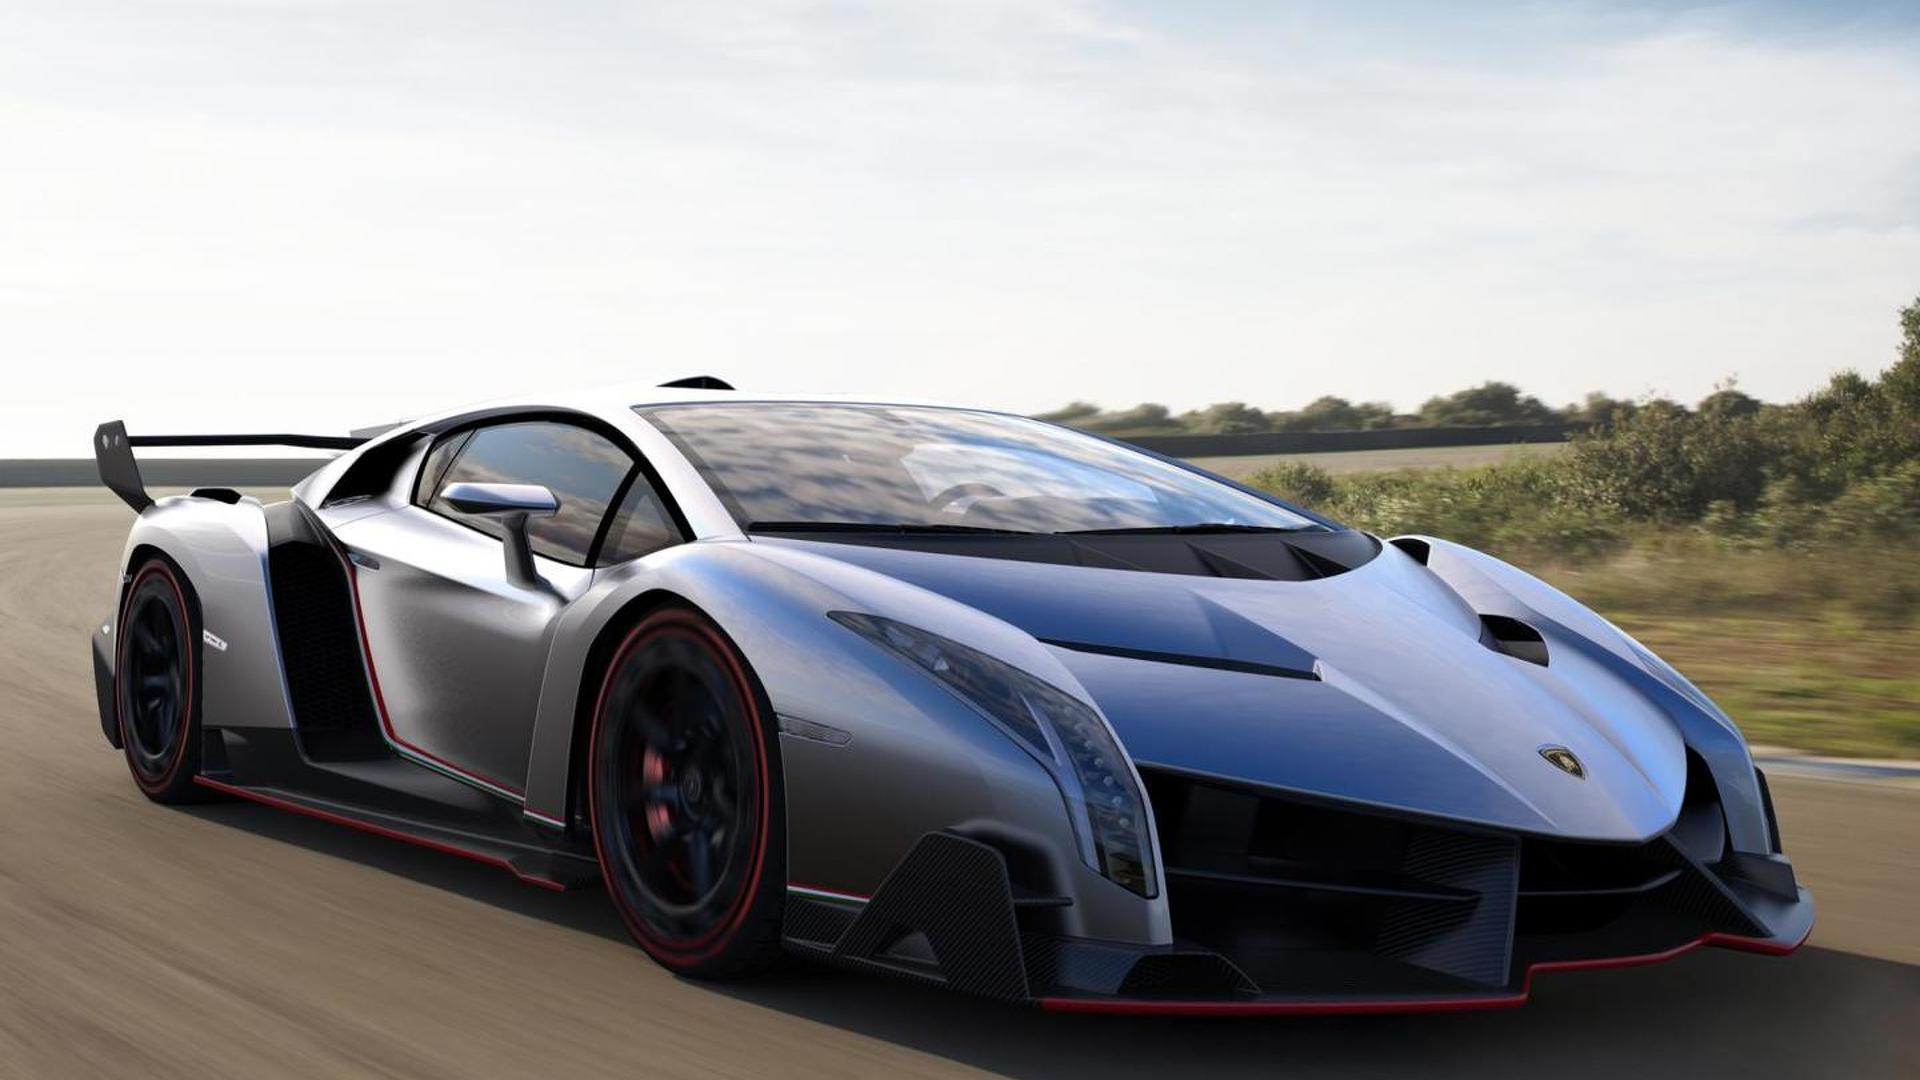 Lamborghini hypercar rumored for Pebble Beach